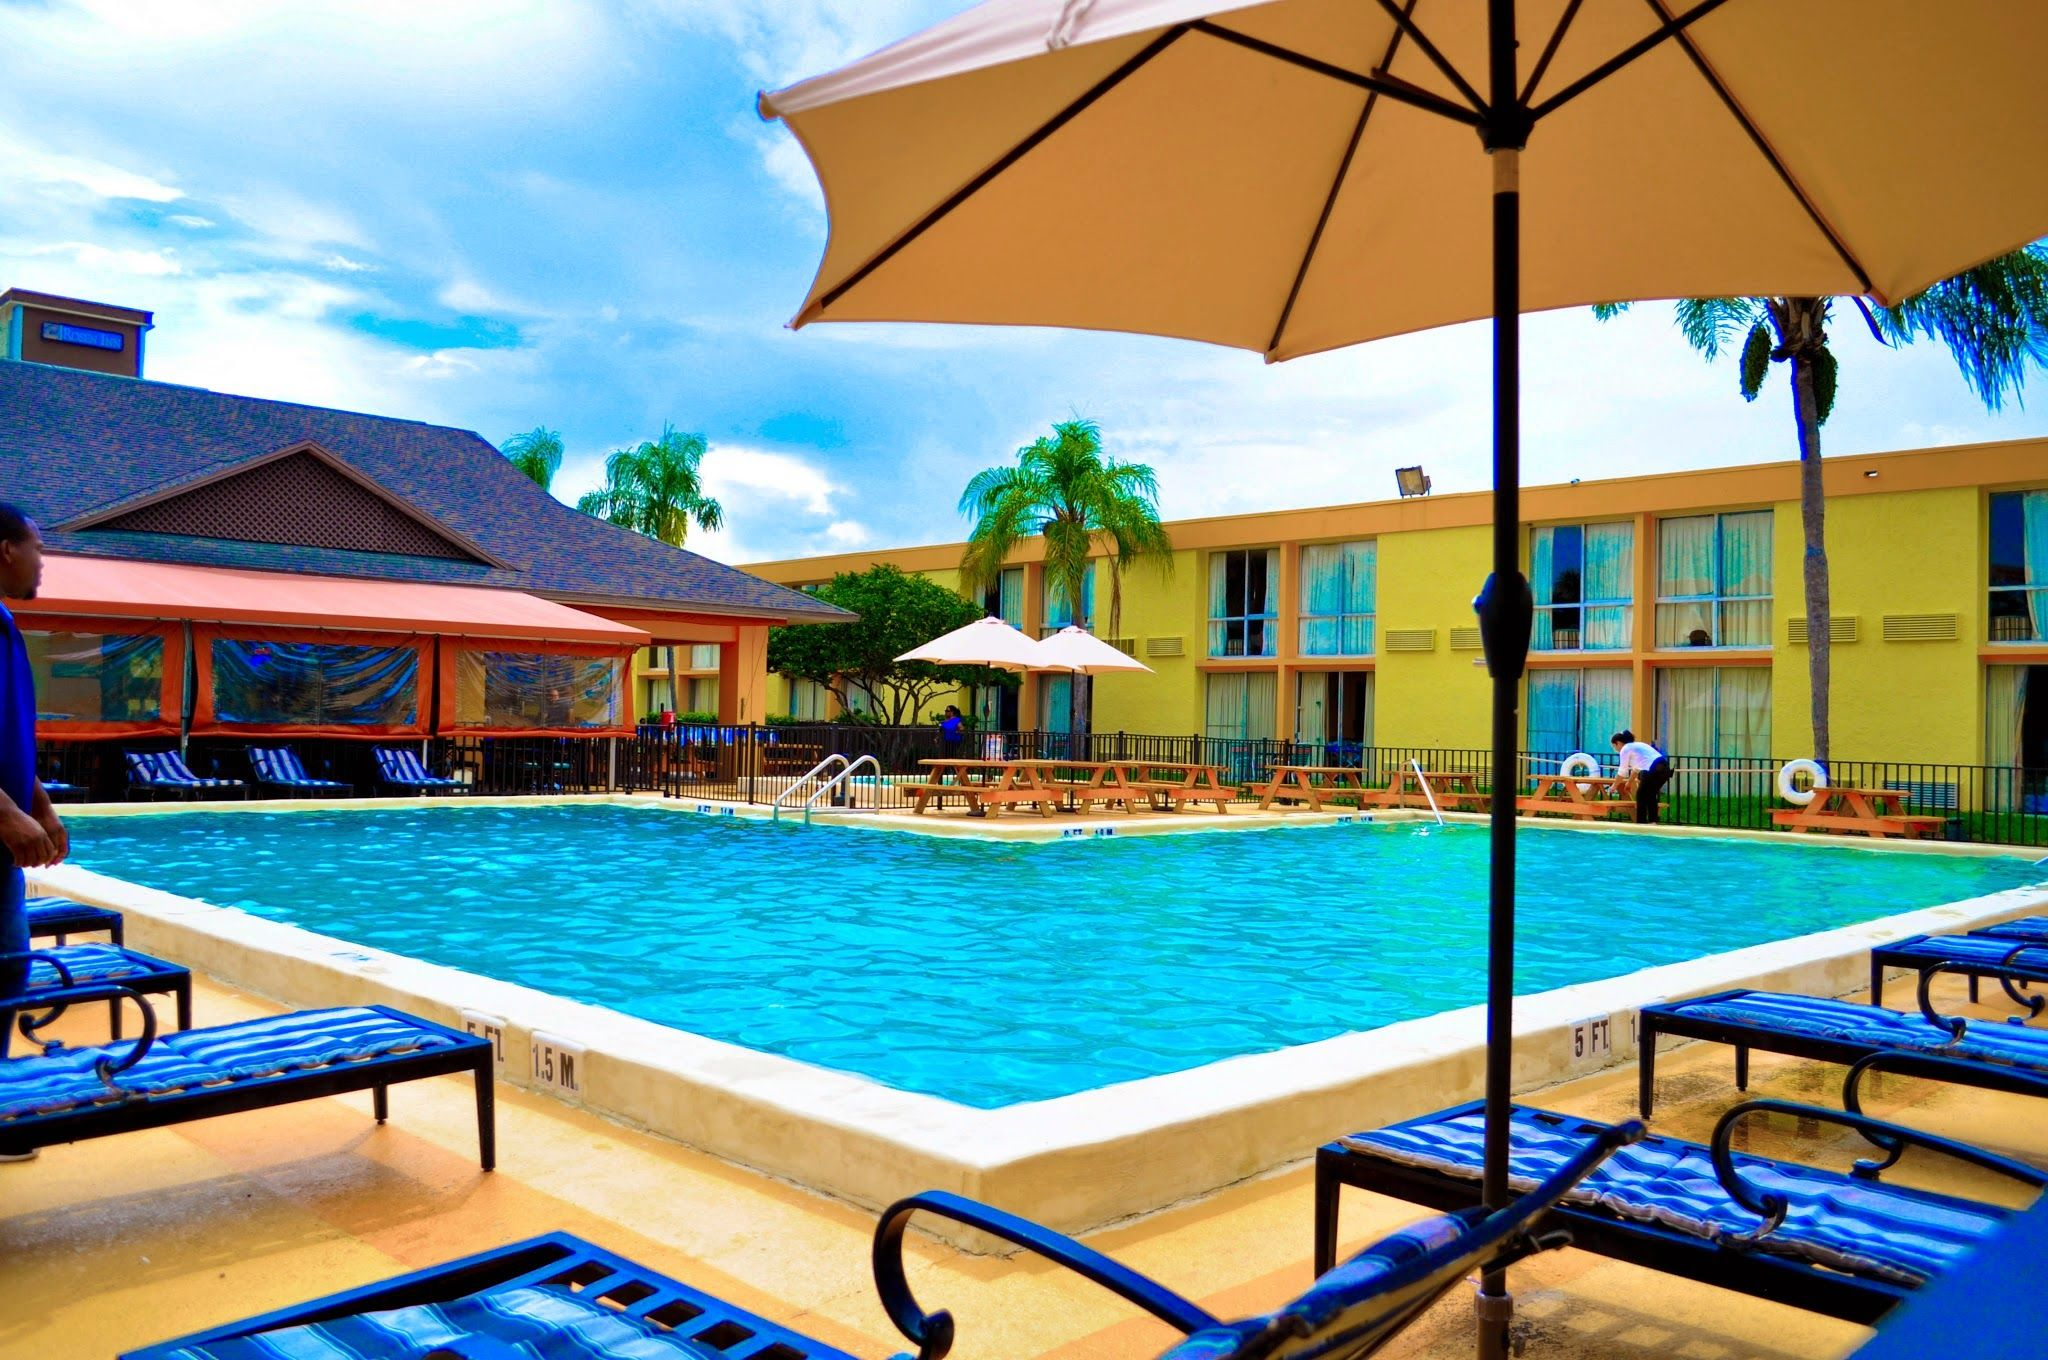 Hotel on International Drive with a nice pool pool